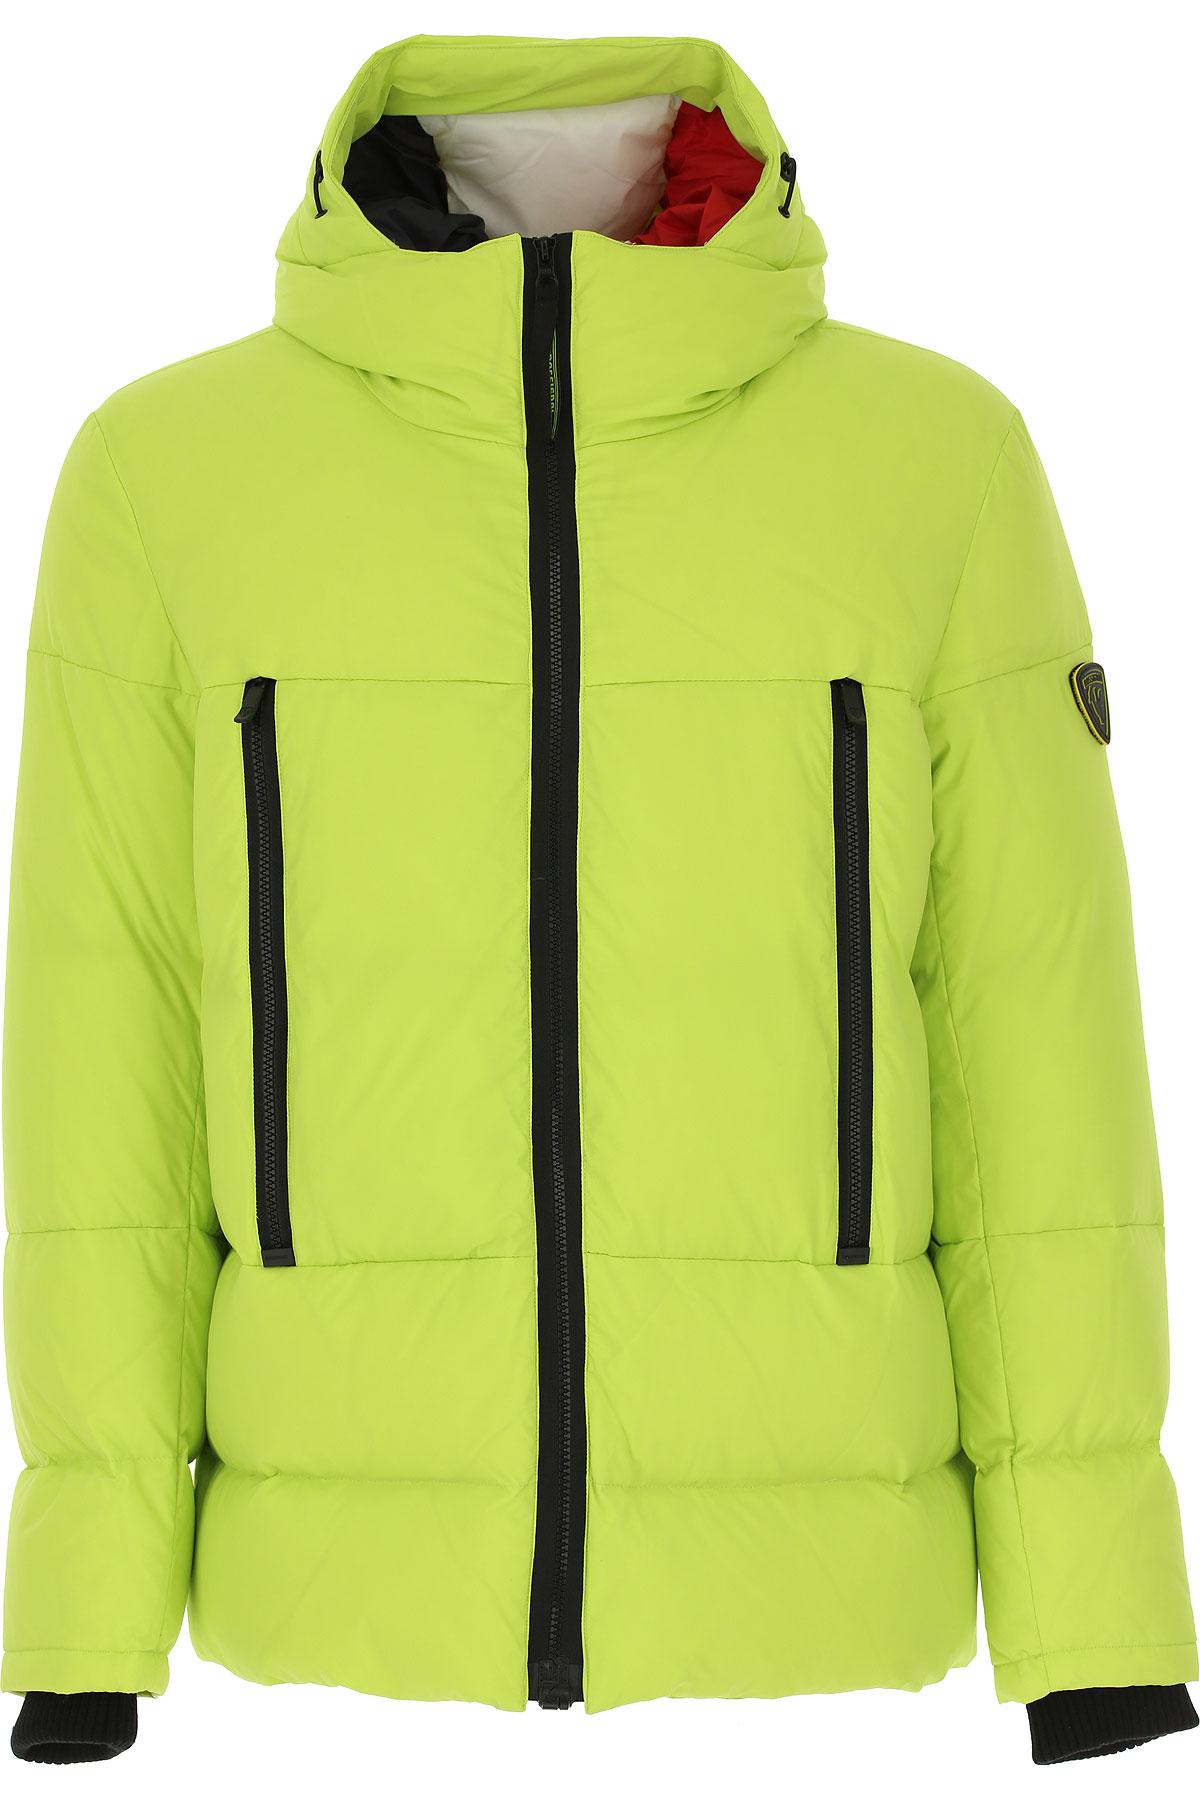 Rossignol Down Jacket for Men, Puffer Ski Jacket, Lime, polyamide, 2019, L M XL